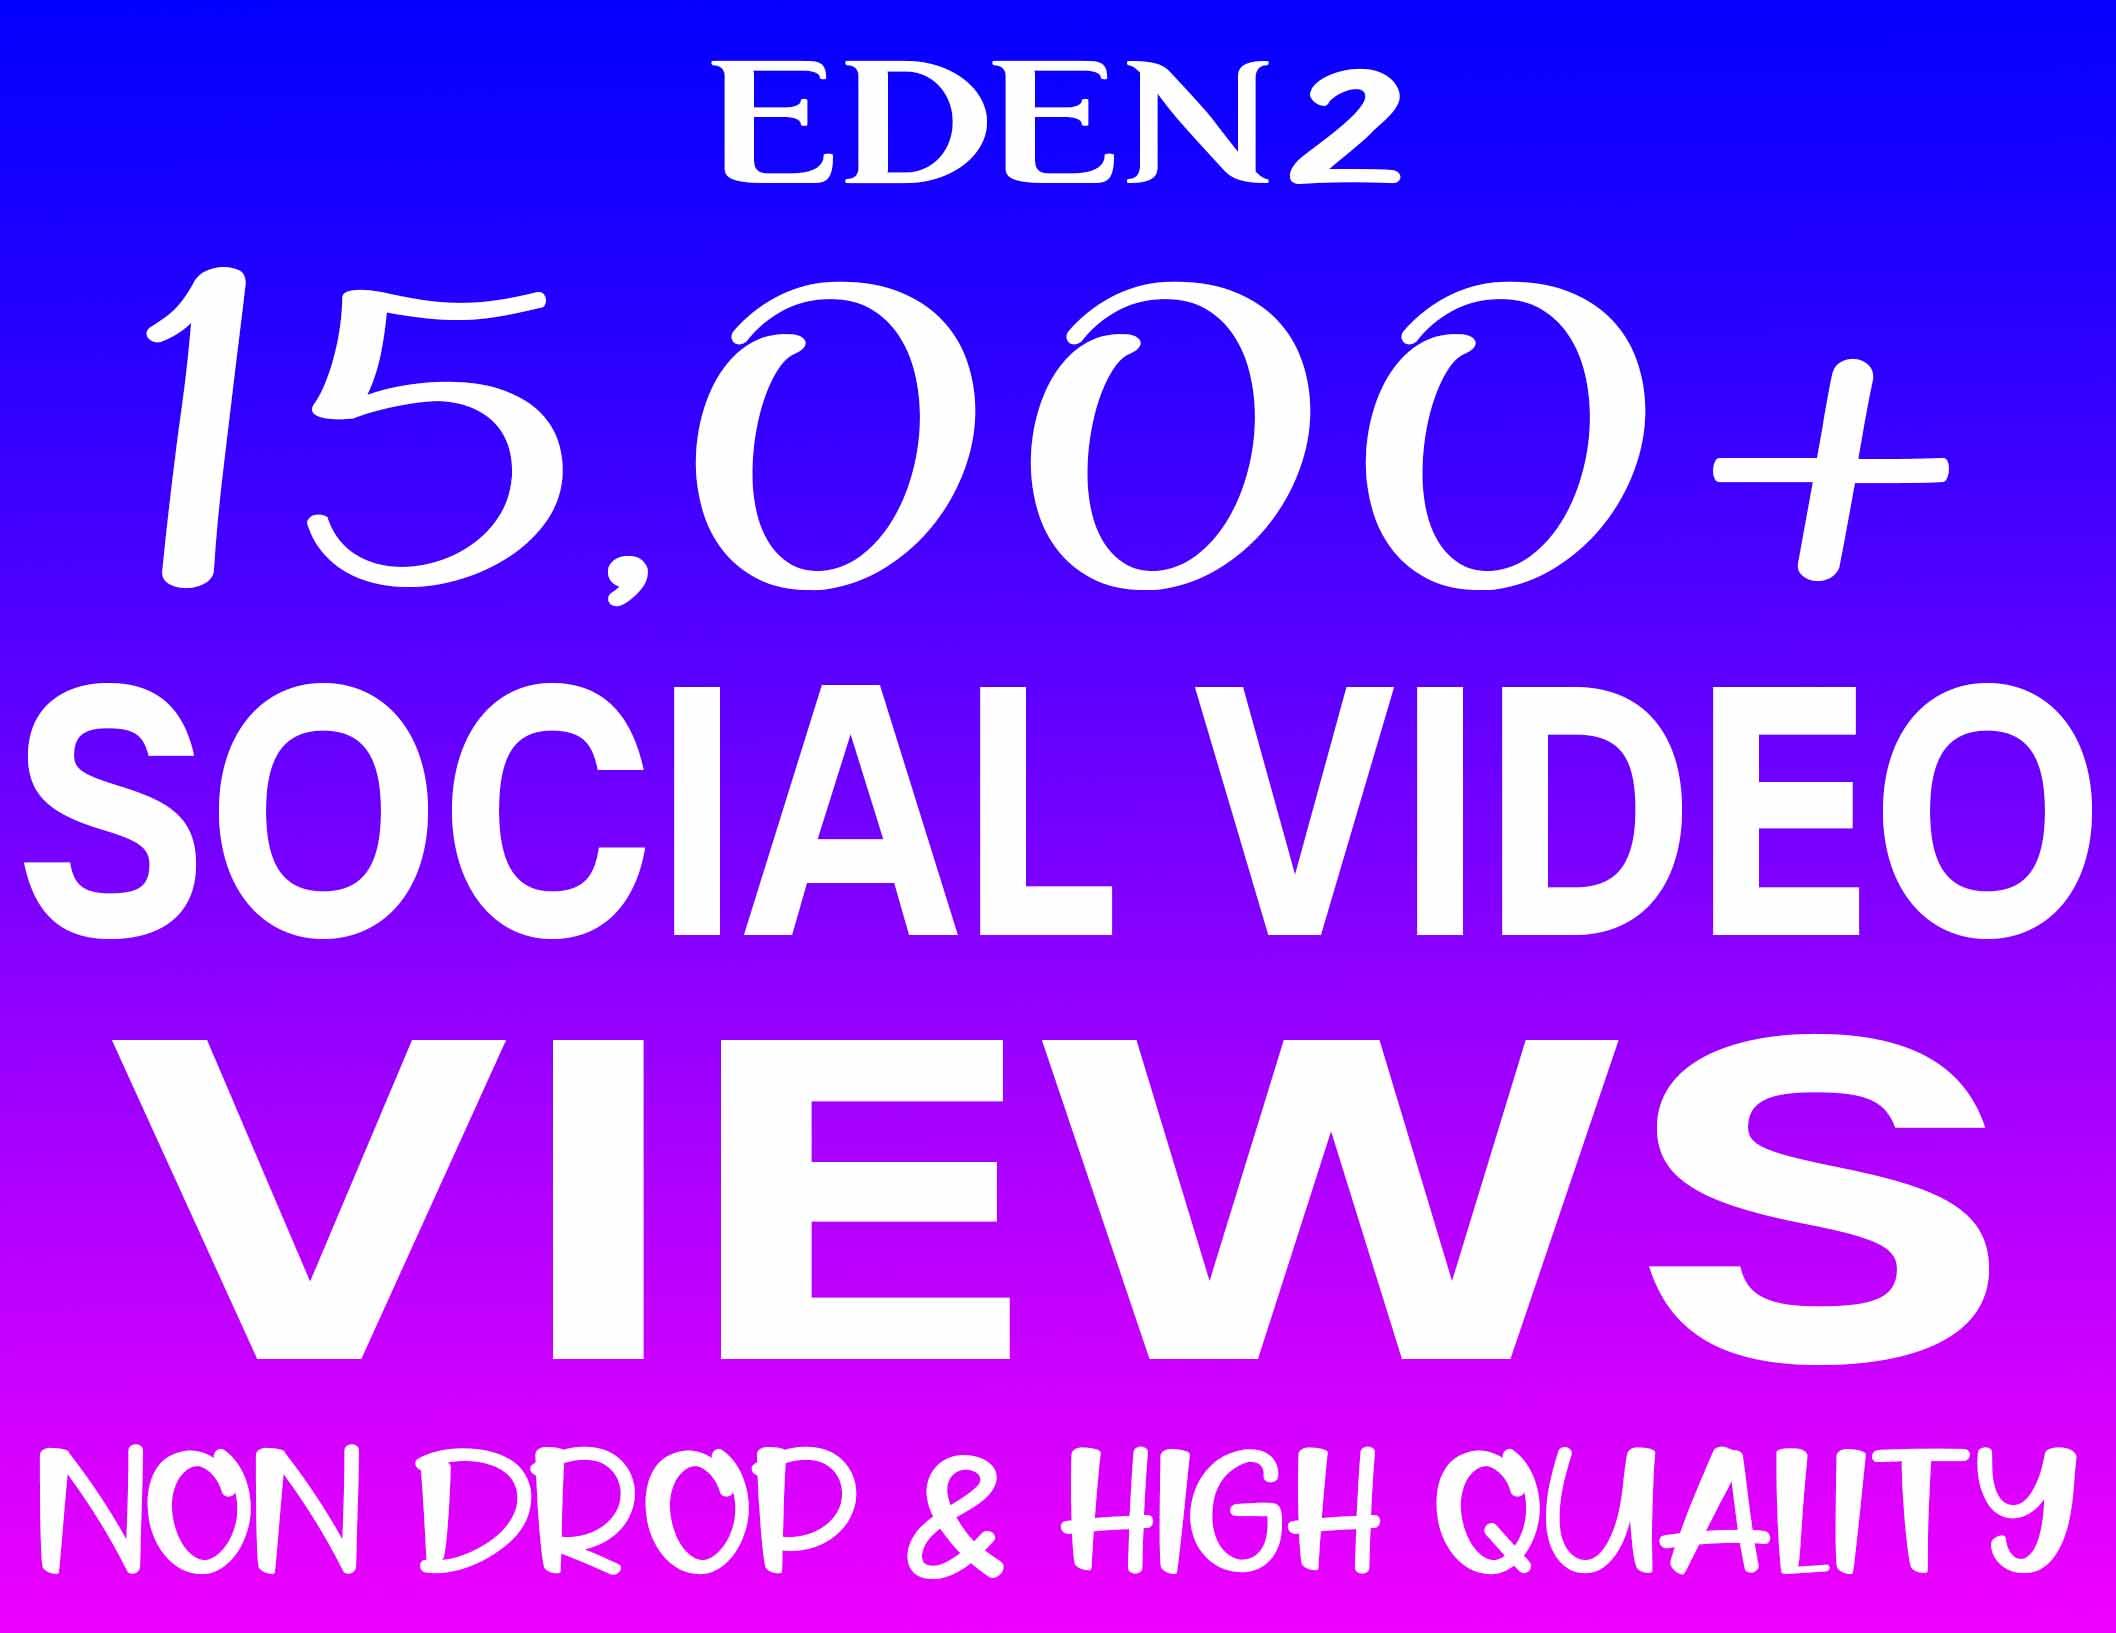 Add 15K Social Video Views Non Drop & High Quality - INSTANT START